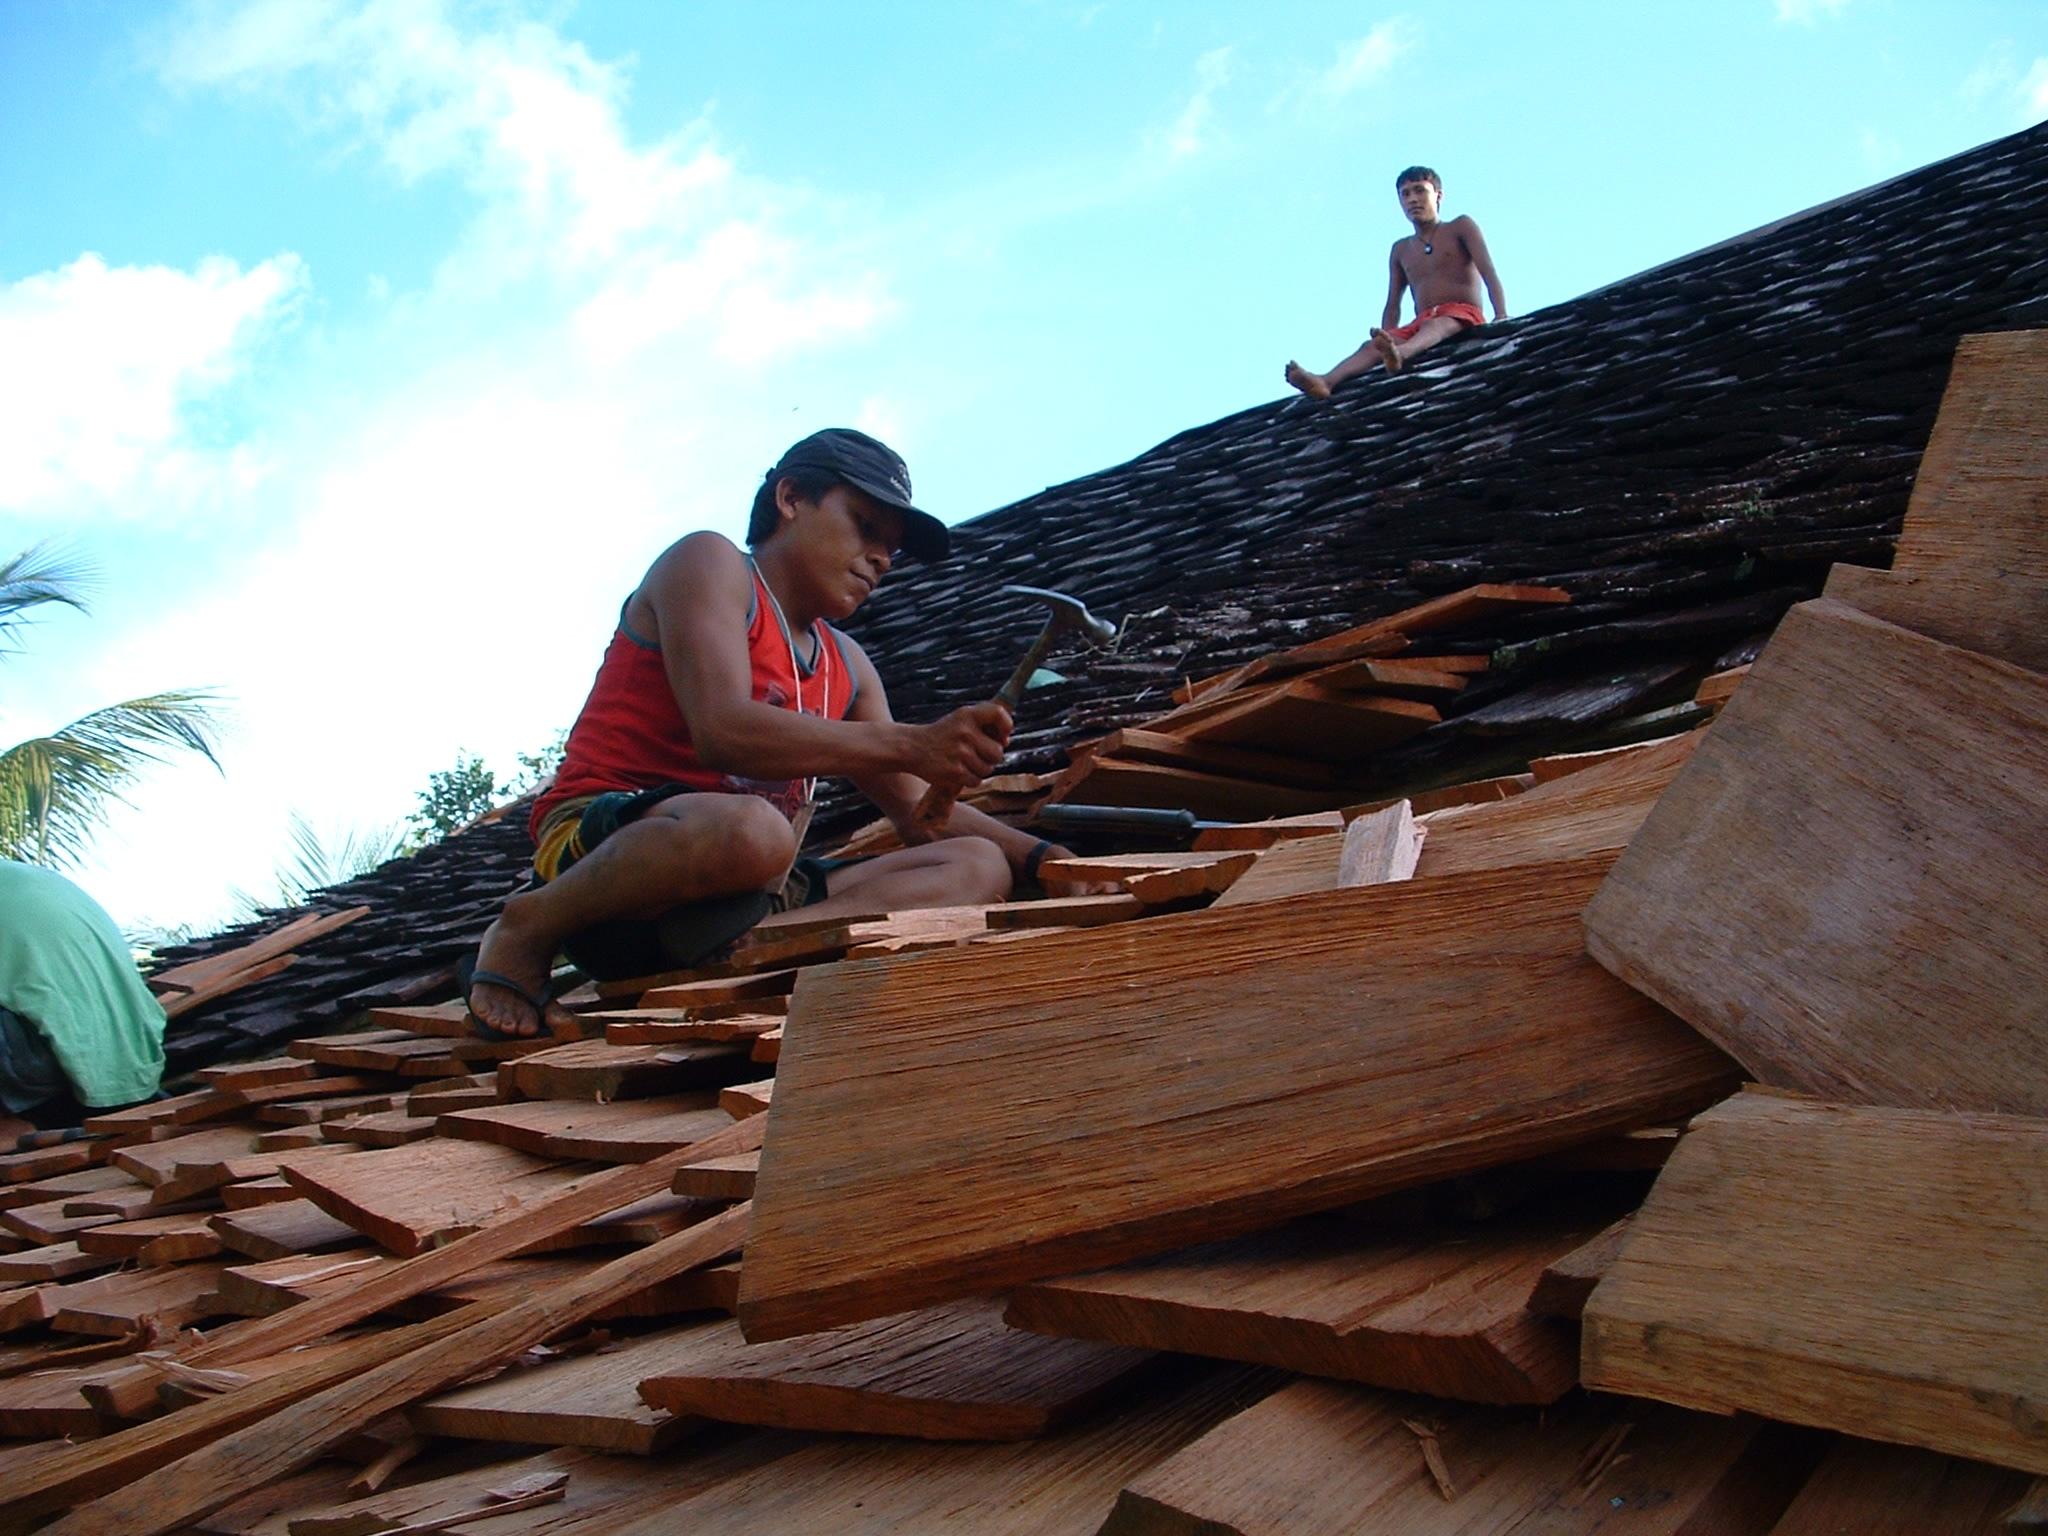 BRA_Yanomami__407 2.jpg